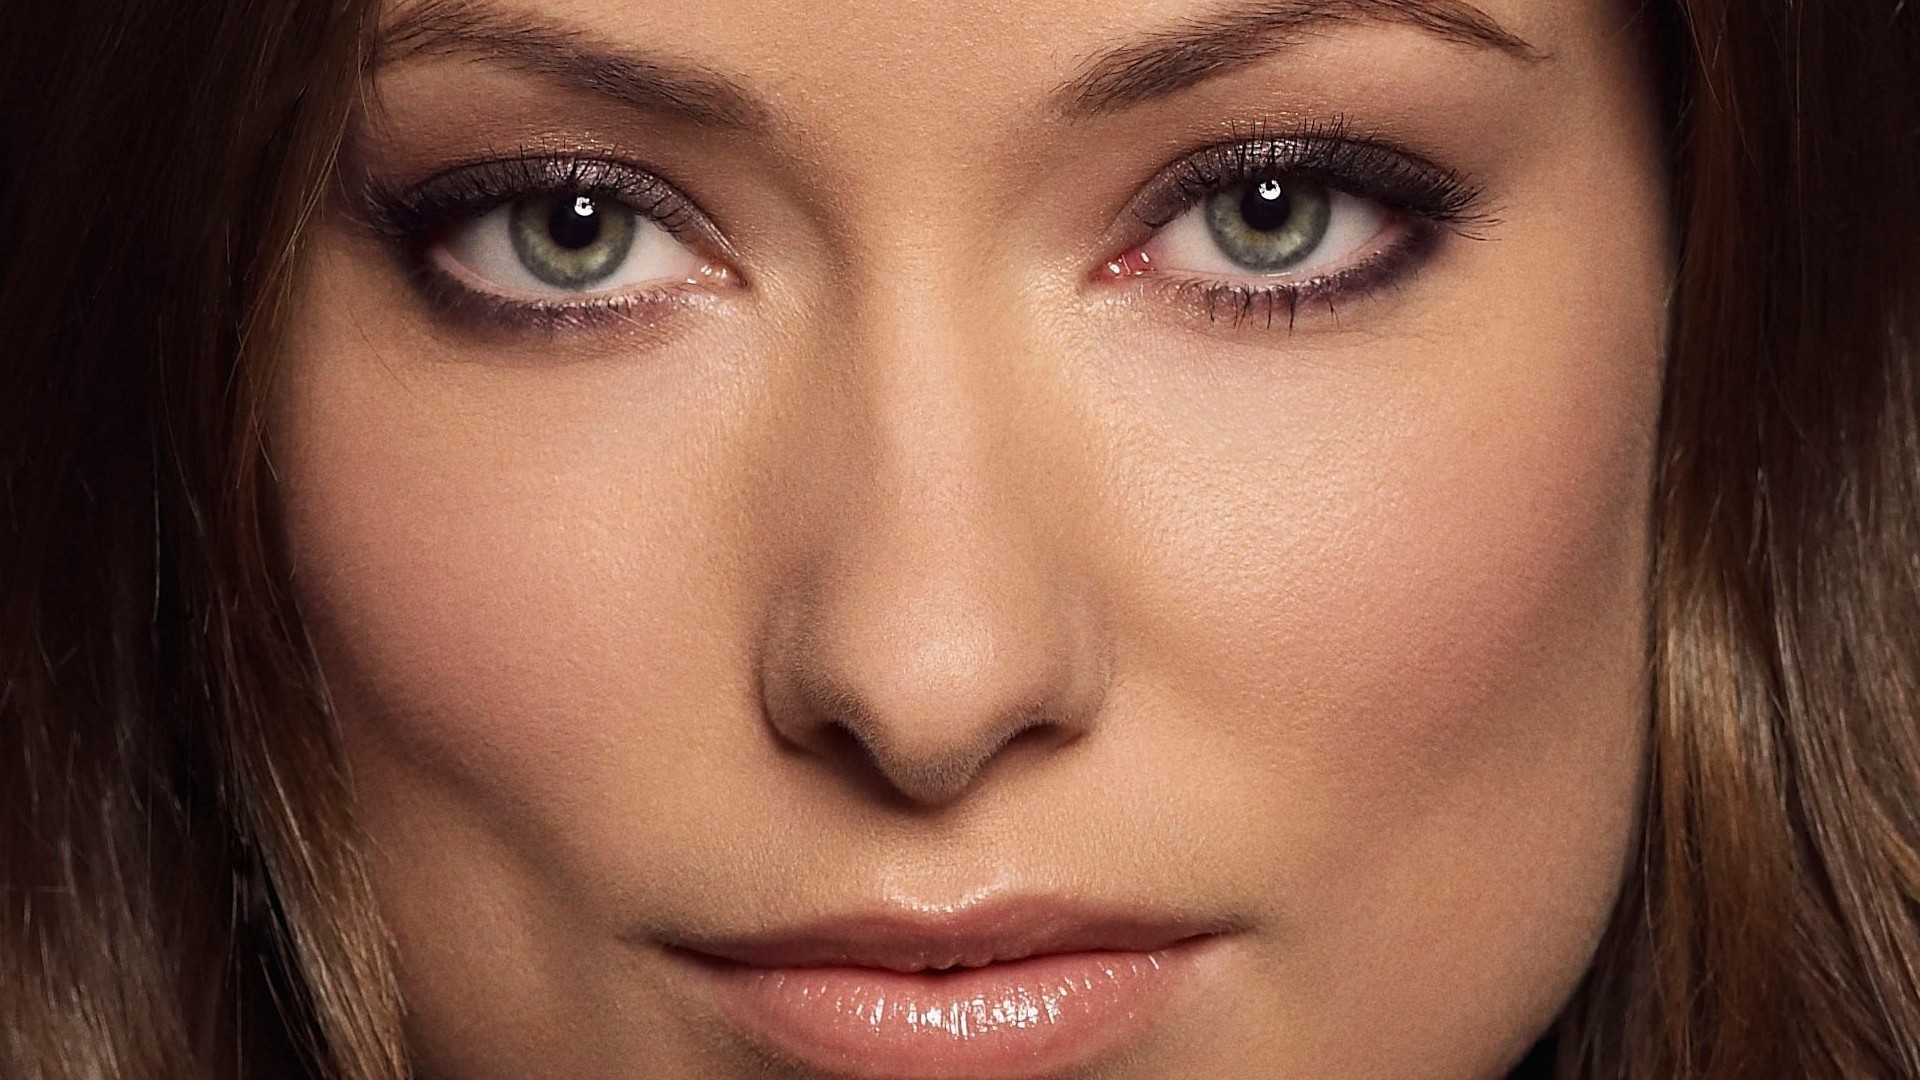 Face · Beautiful Face Olivia Wilde HD Wallpaper